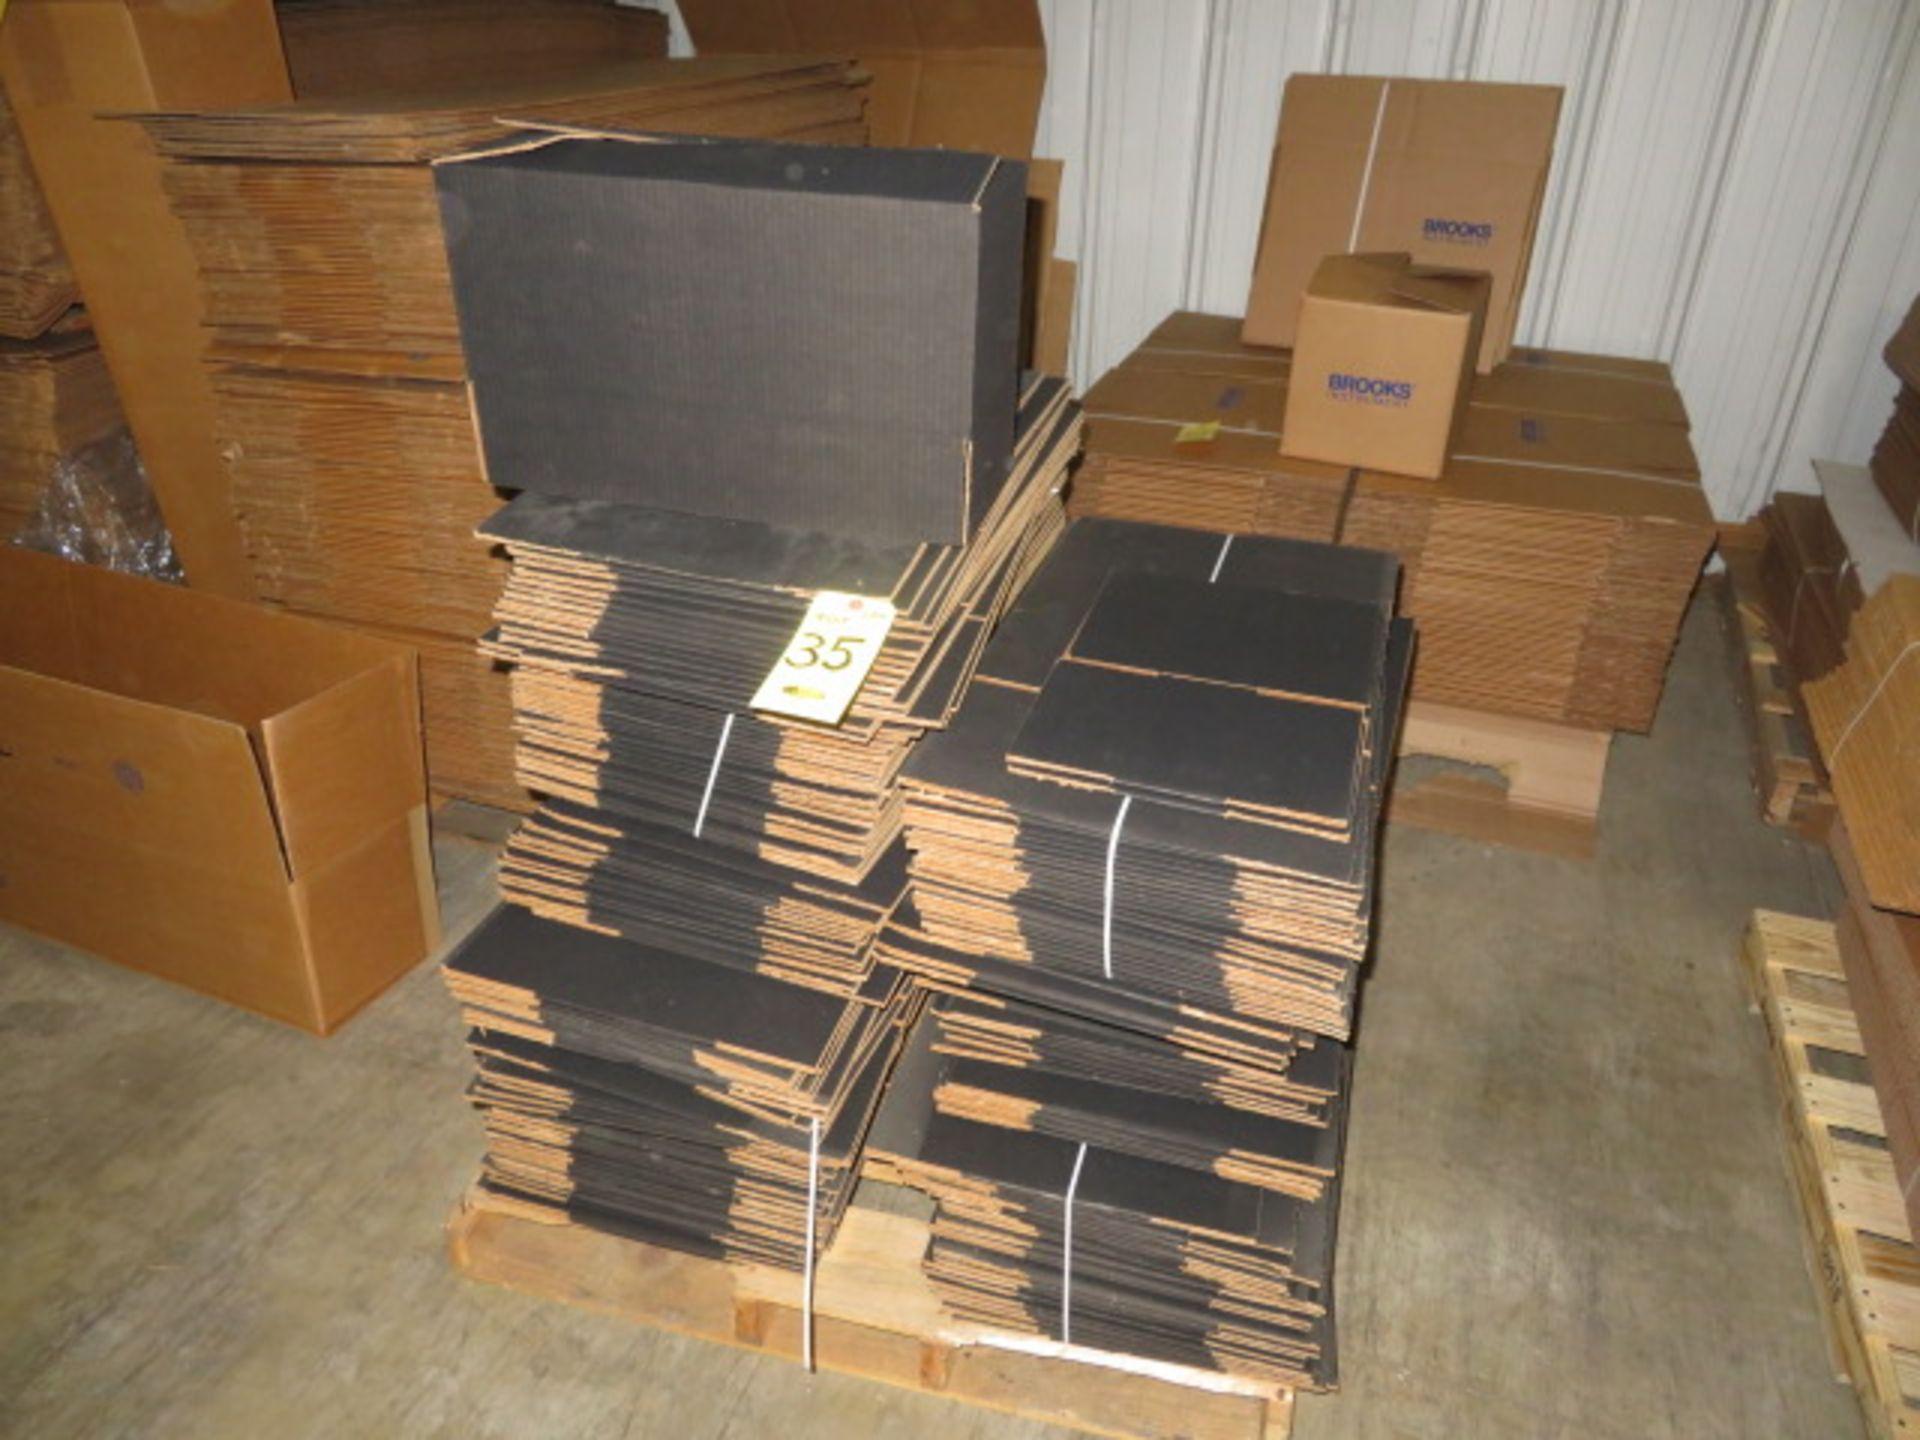 ( 160+) 20 X 8-1/2 X 8-1/4 IN BLACK K/D CORRUGATED BOXES